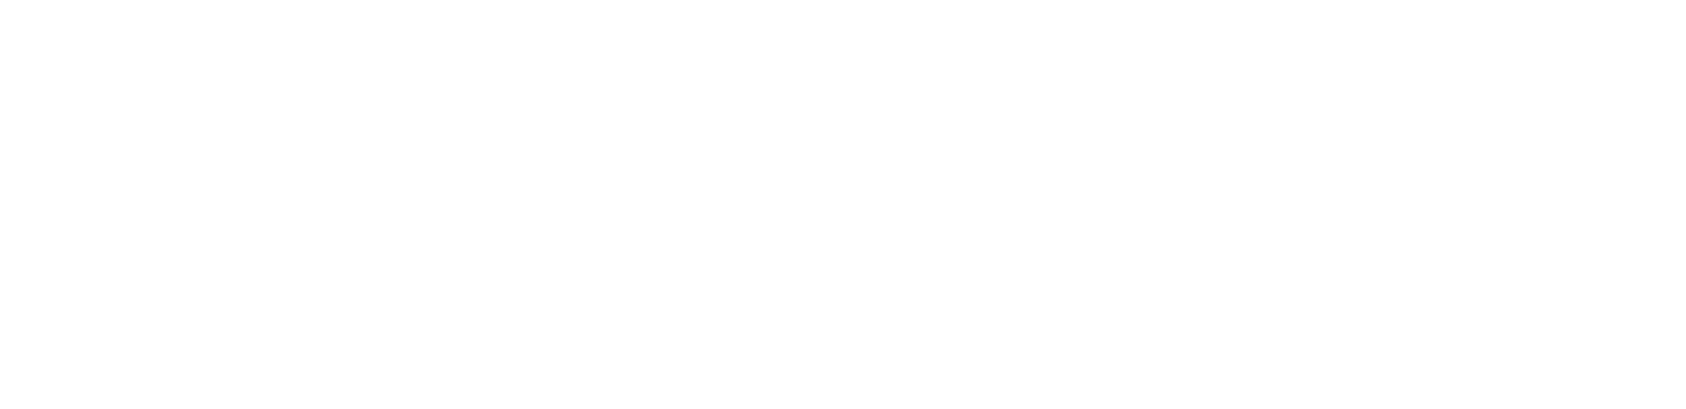 PayPal Commerce Platform for WooCommerce